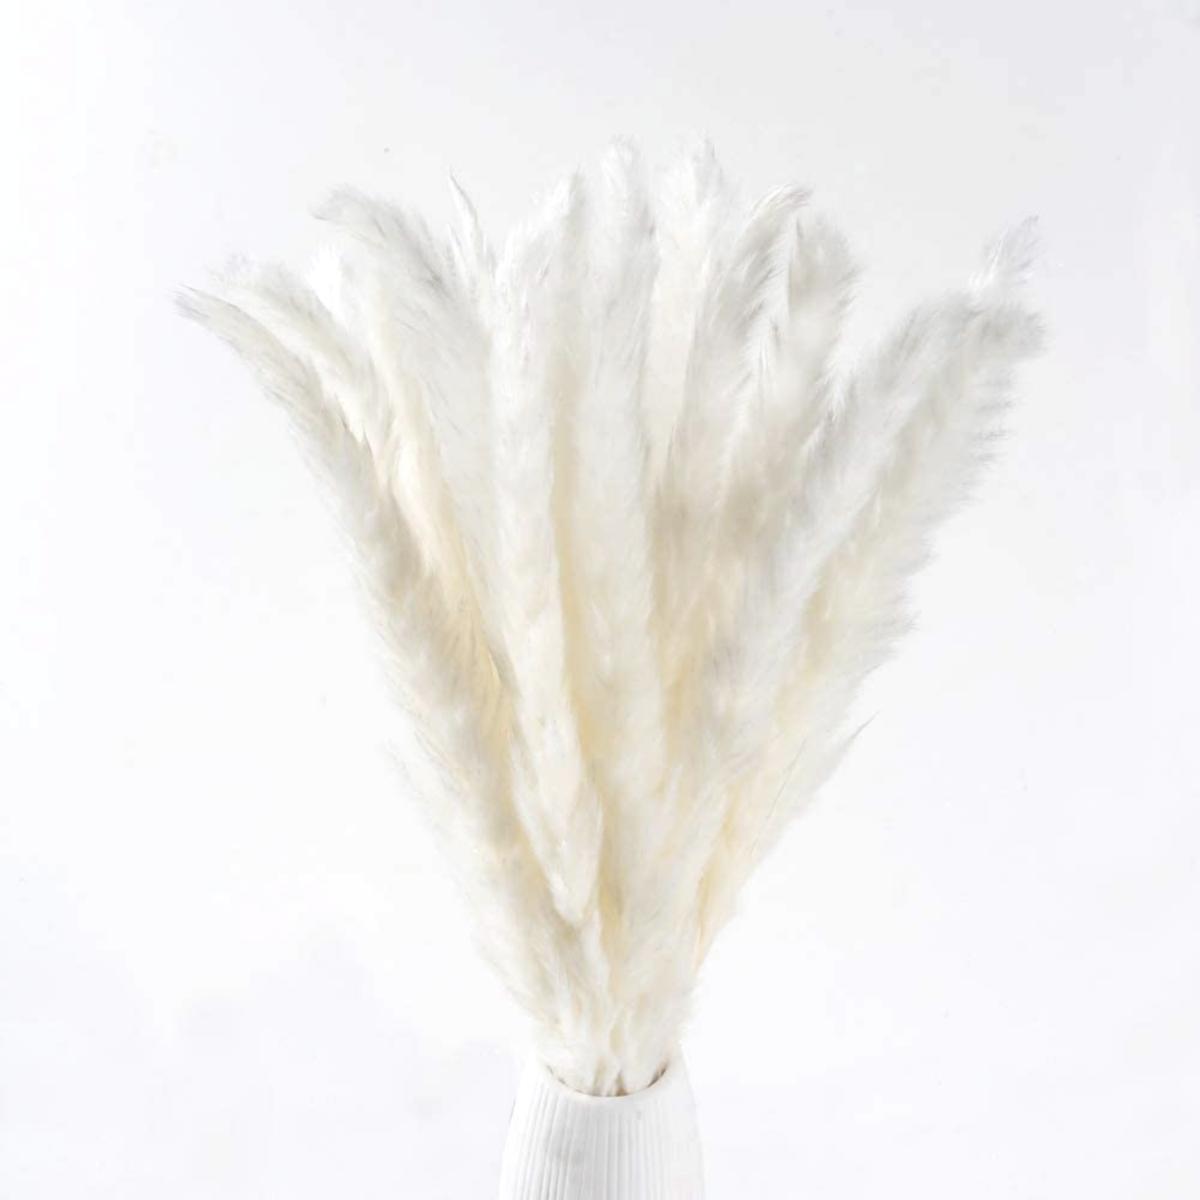 White Pampas Grass Decor